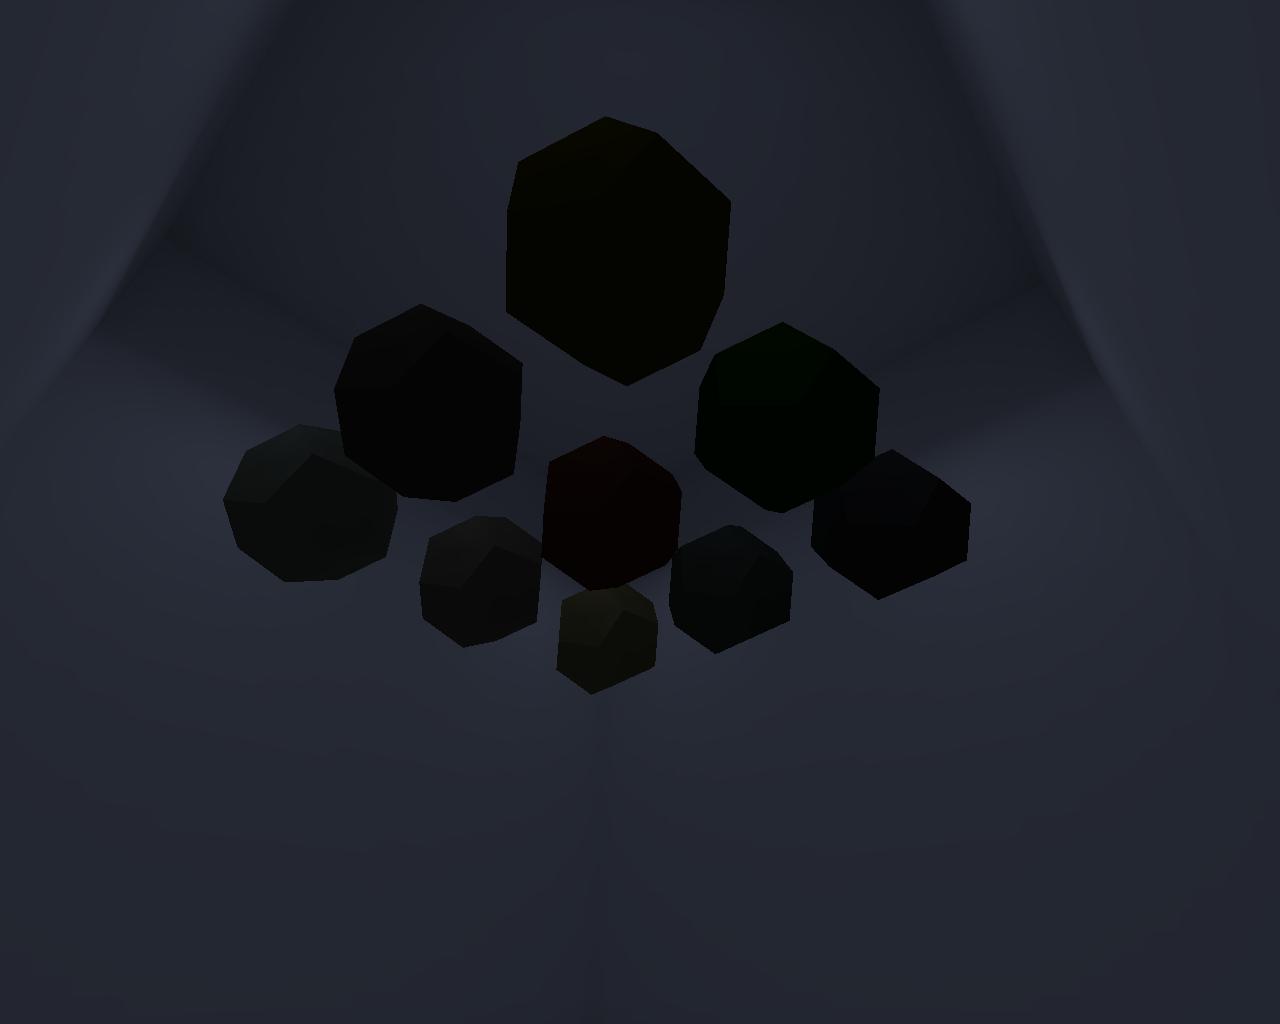 Додэкаэдры [анимированный PNG] - Half-Life animated PNG, APNG, ln_cube, додэкаэдр